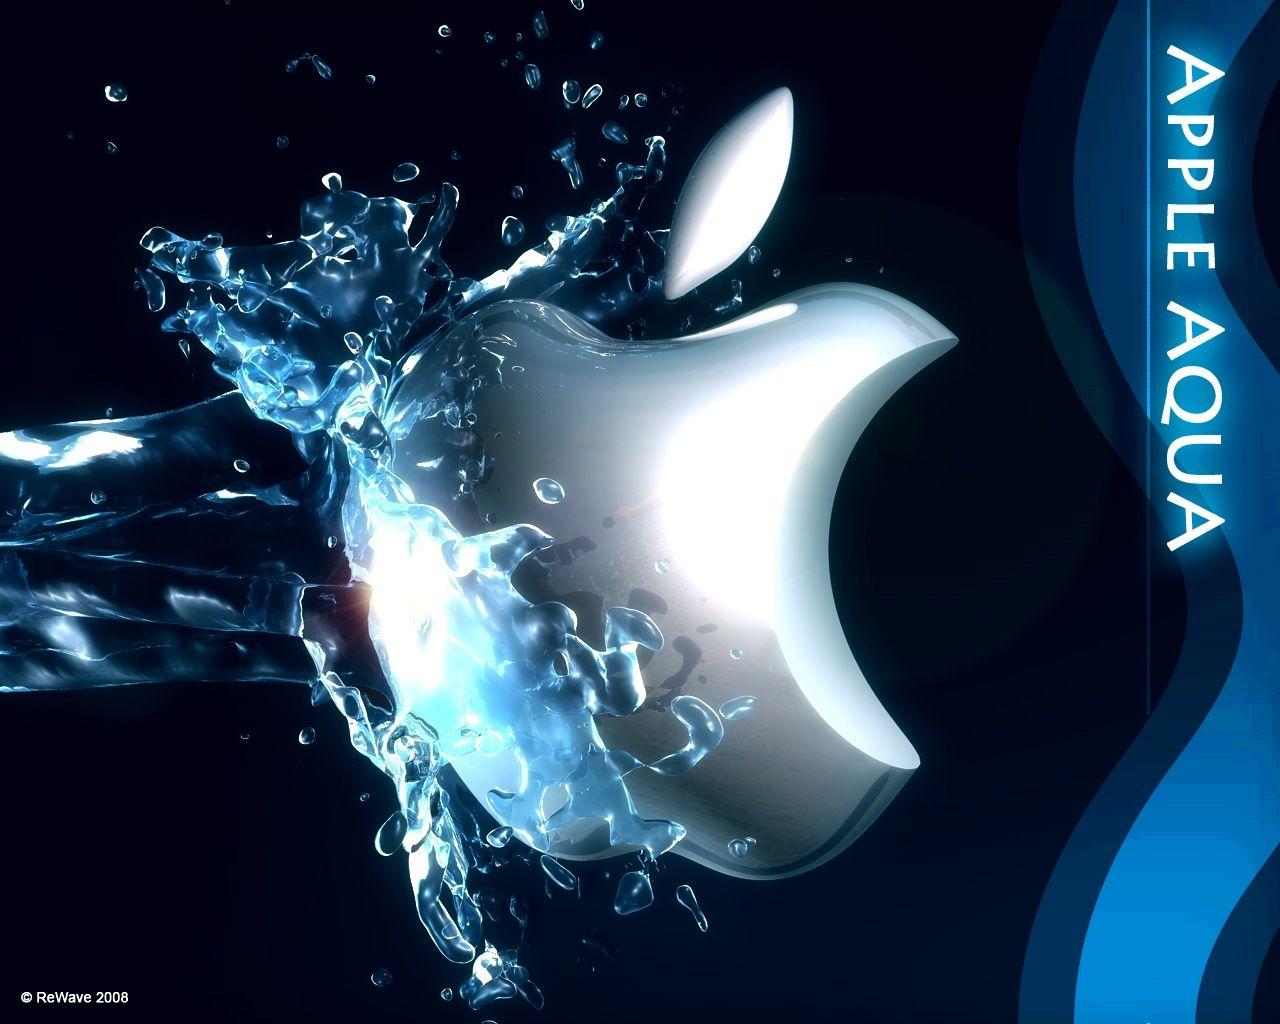 Apple Inc Wallpaper Apple Aqua Wallpapers Hd Wallpapers 92982 Apple Wallpaper Apple Iphone Wallpaper Hd Apple Logo Wallpaper Iphone